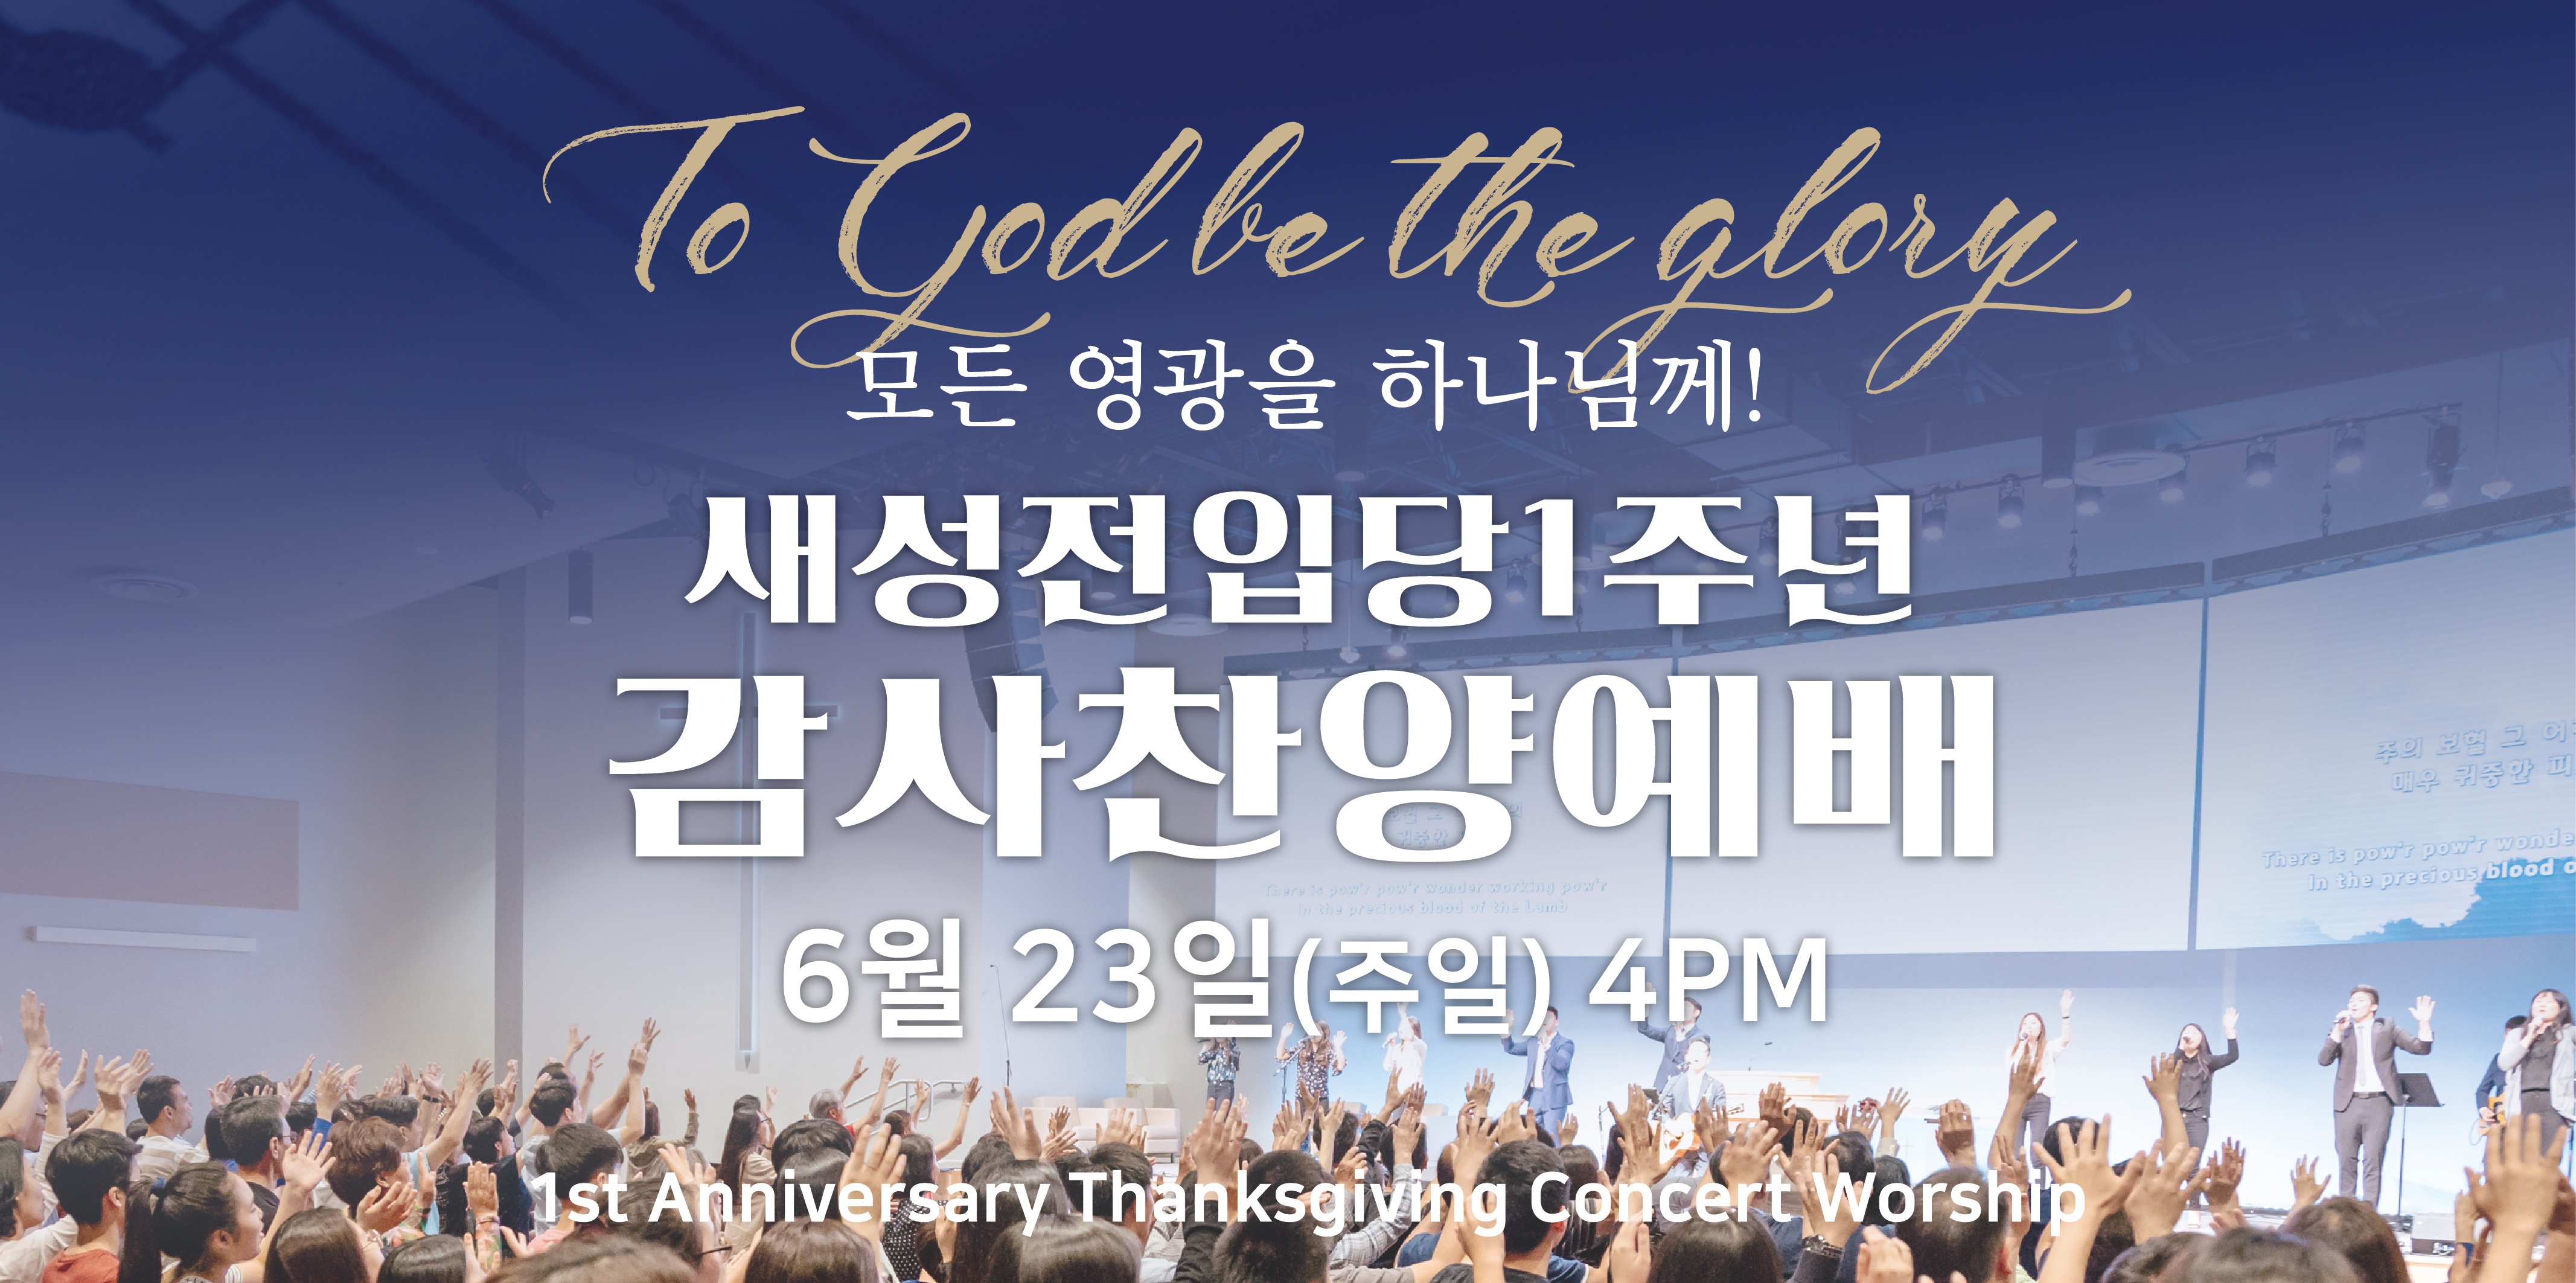 1st Anniversary Thanksgiving Concert Worship